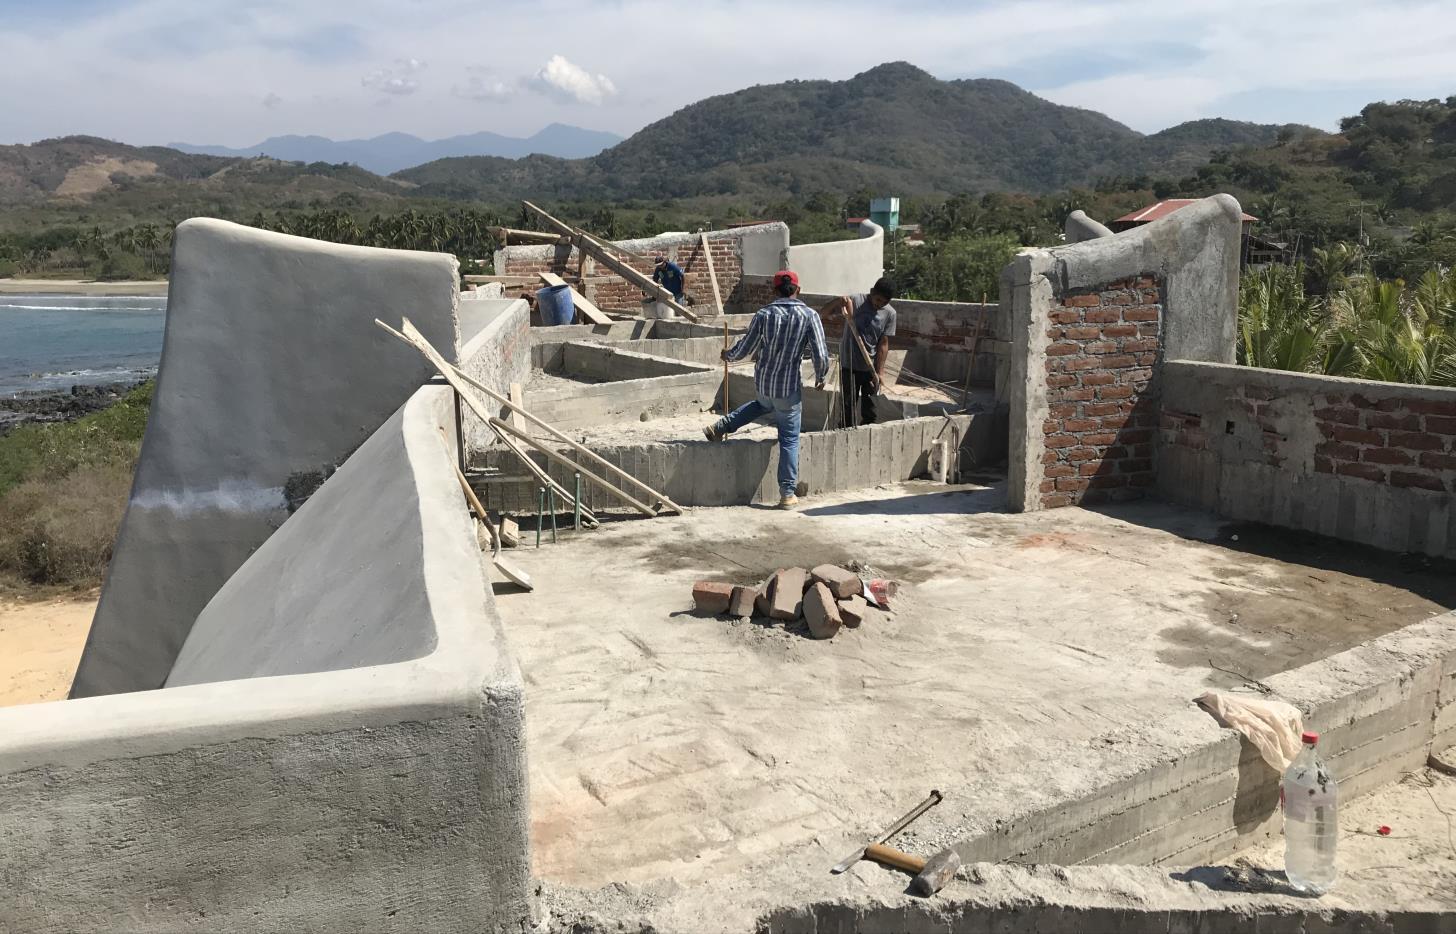 REPORTE-FOTOGRAFICO-PUNTA-MAJAHUA-21-DE-ENERO-DEL-2018-030.jpg